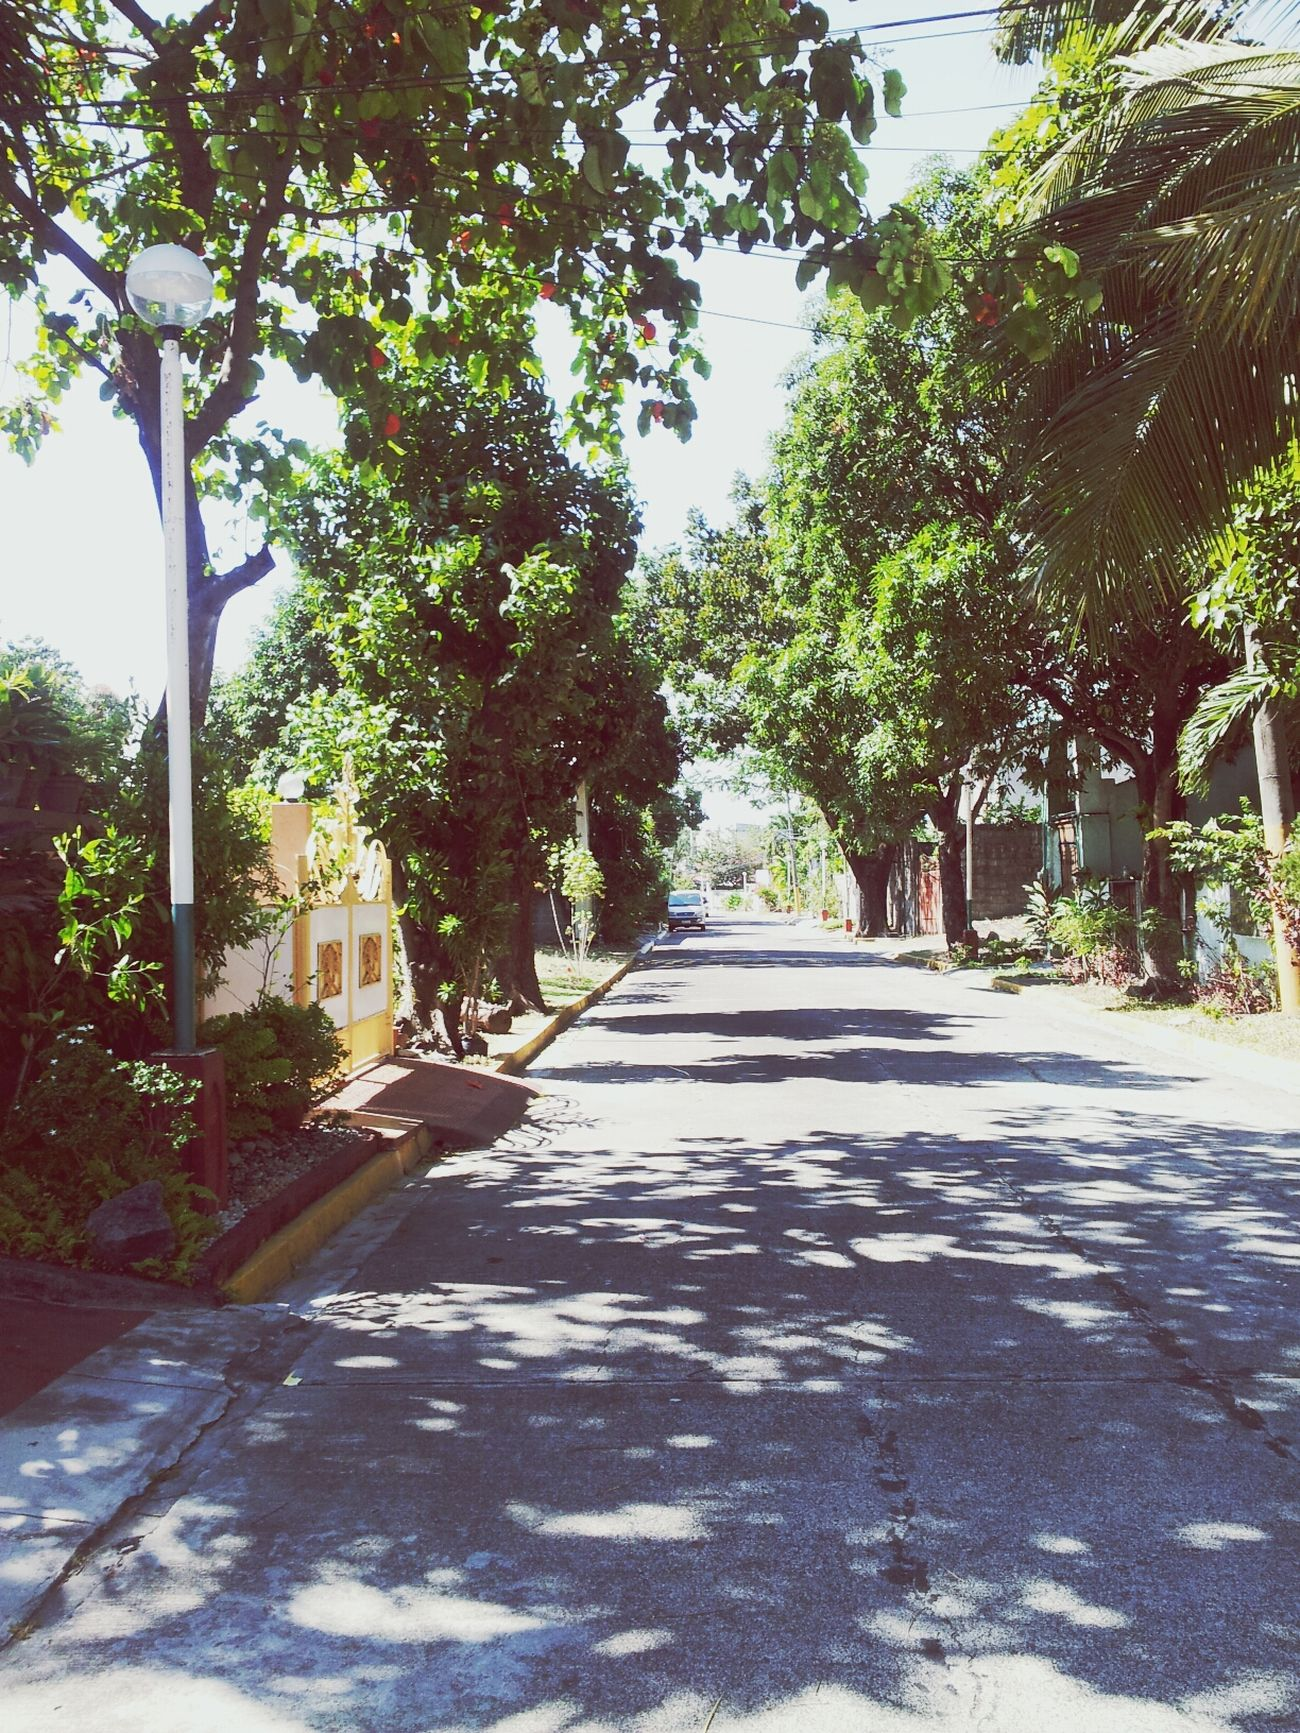 Ally's street